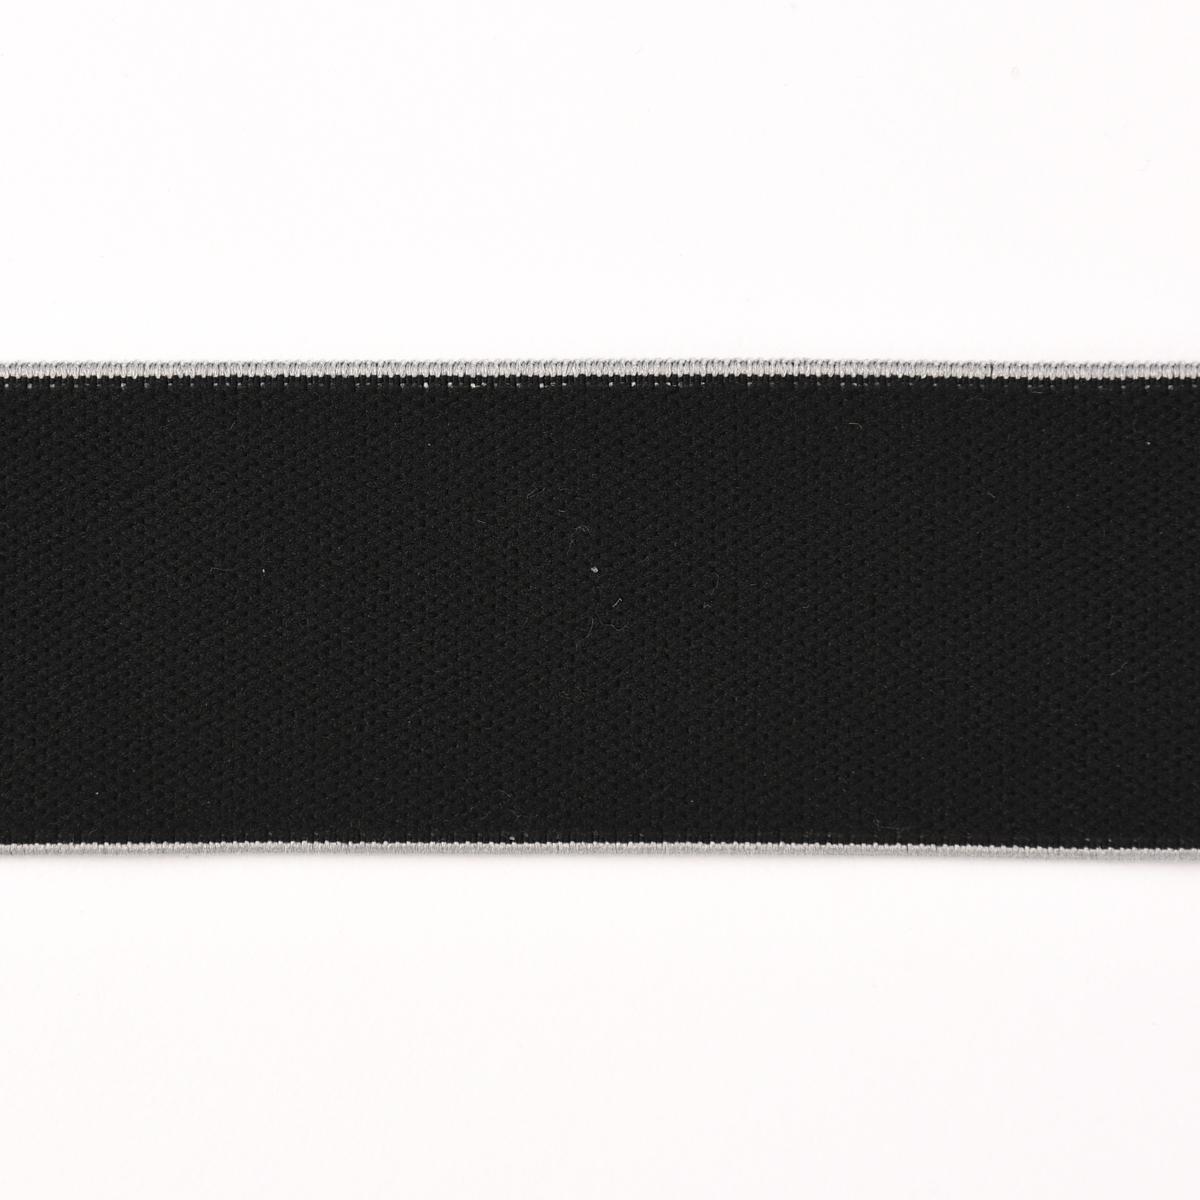 Gummiband mit farbigem Rand schwarz grau Breite: 4cm